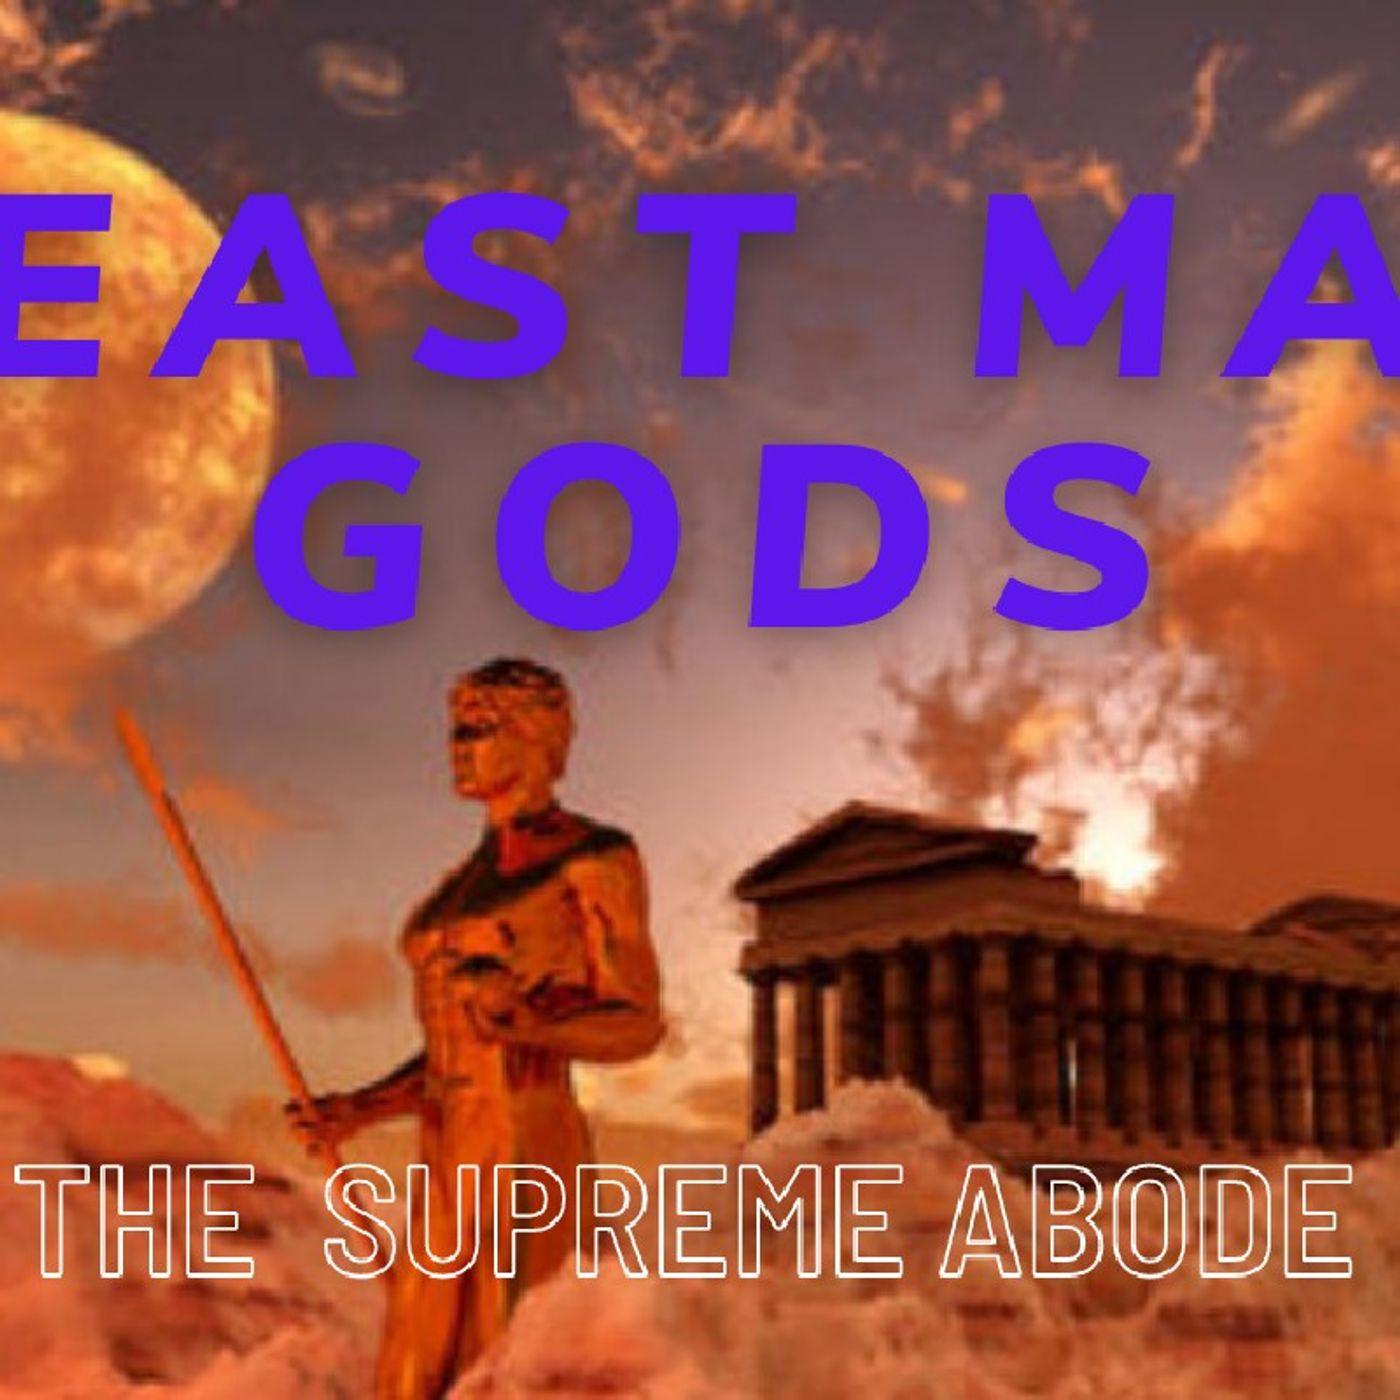 BEAST MAN GOD   SUPERIOR AFFIRMATIONS    THE DWELLING OF MAN